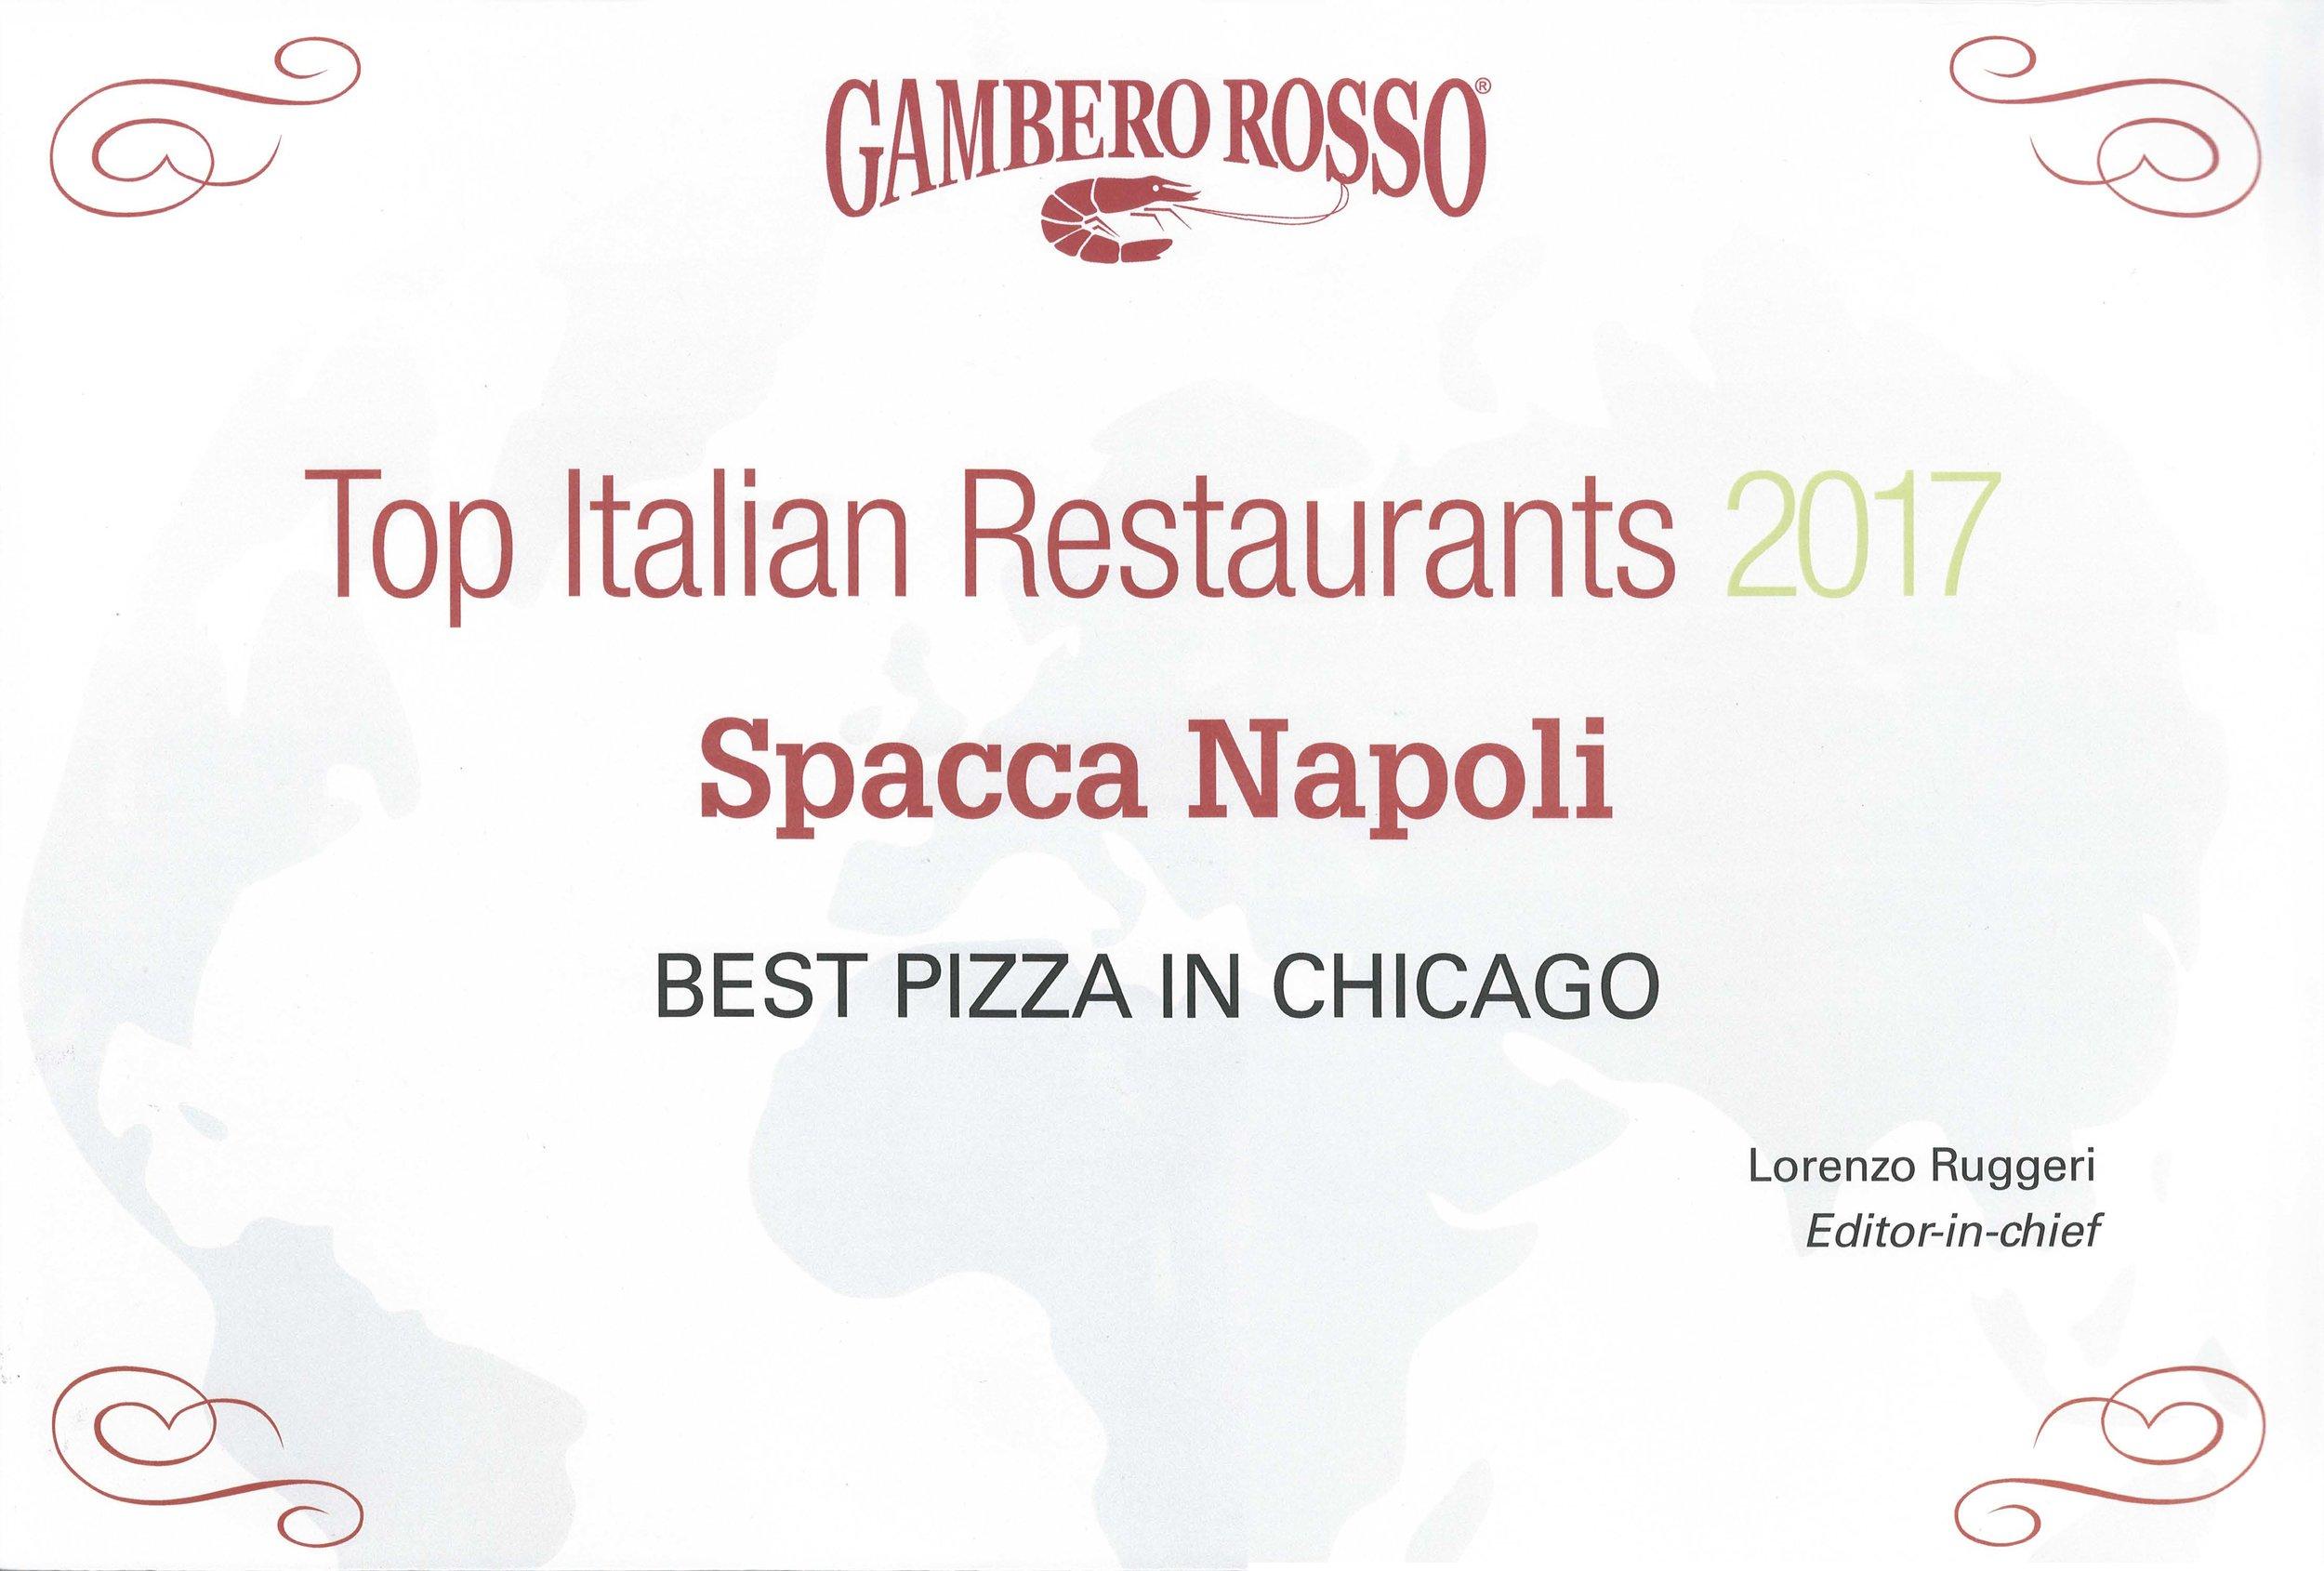 Gambero_Rosso_Best_Pizza_in_Chicago_2017-2.jpg